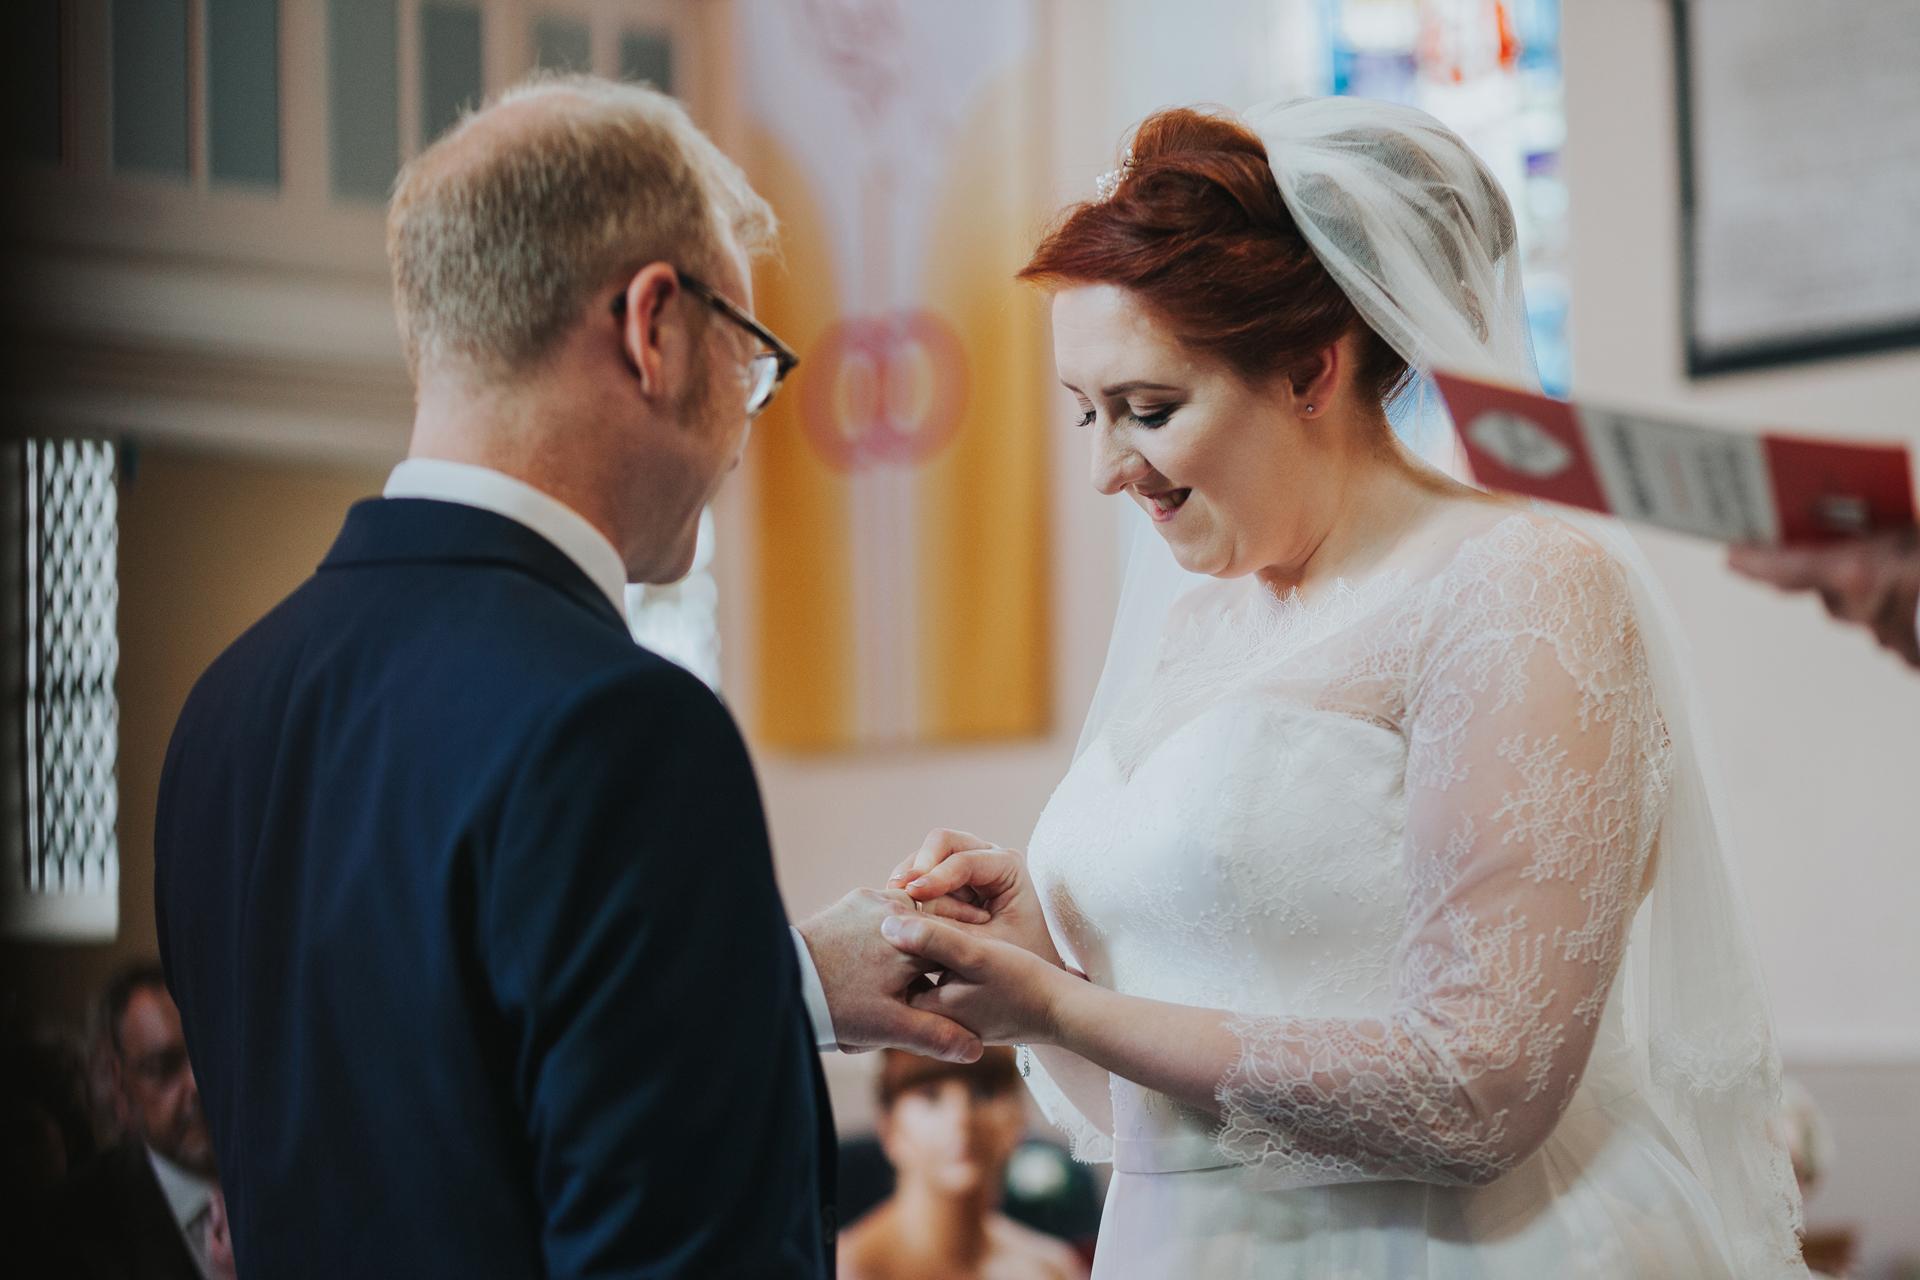 Bride puts ring on grooms finger.